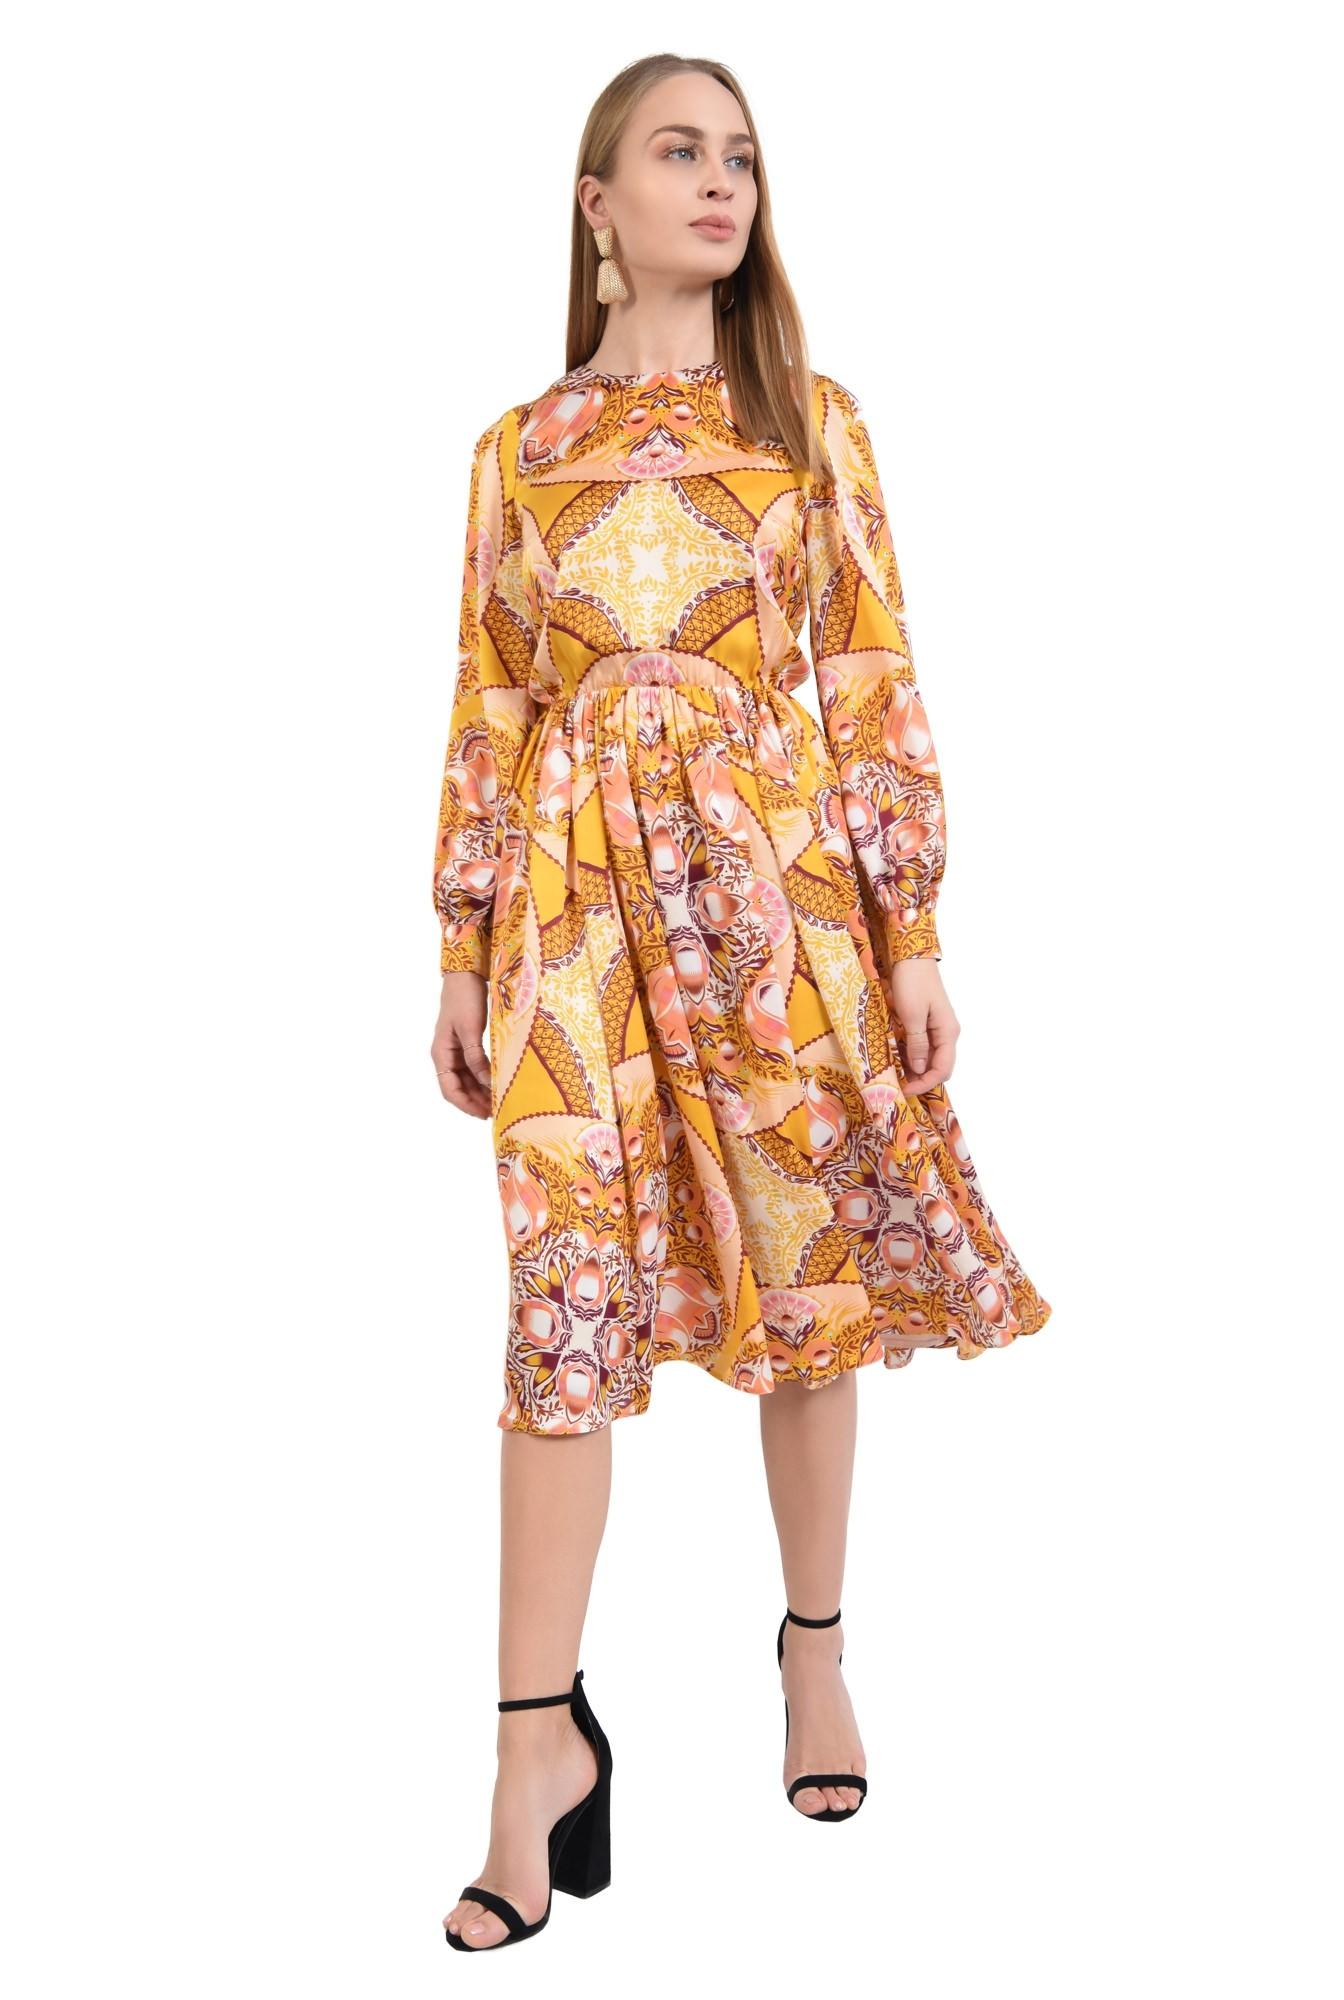 360 - rochie imprimata, midi, croi pe bie, galben mustar, imprimeu abstract